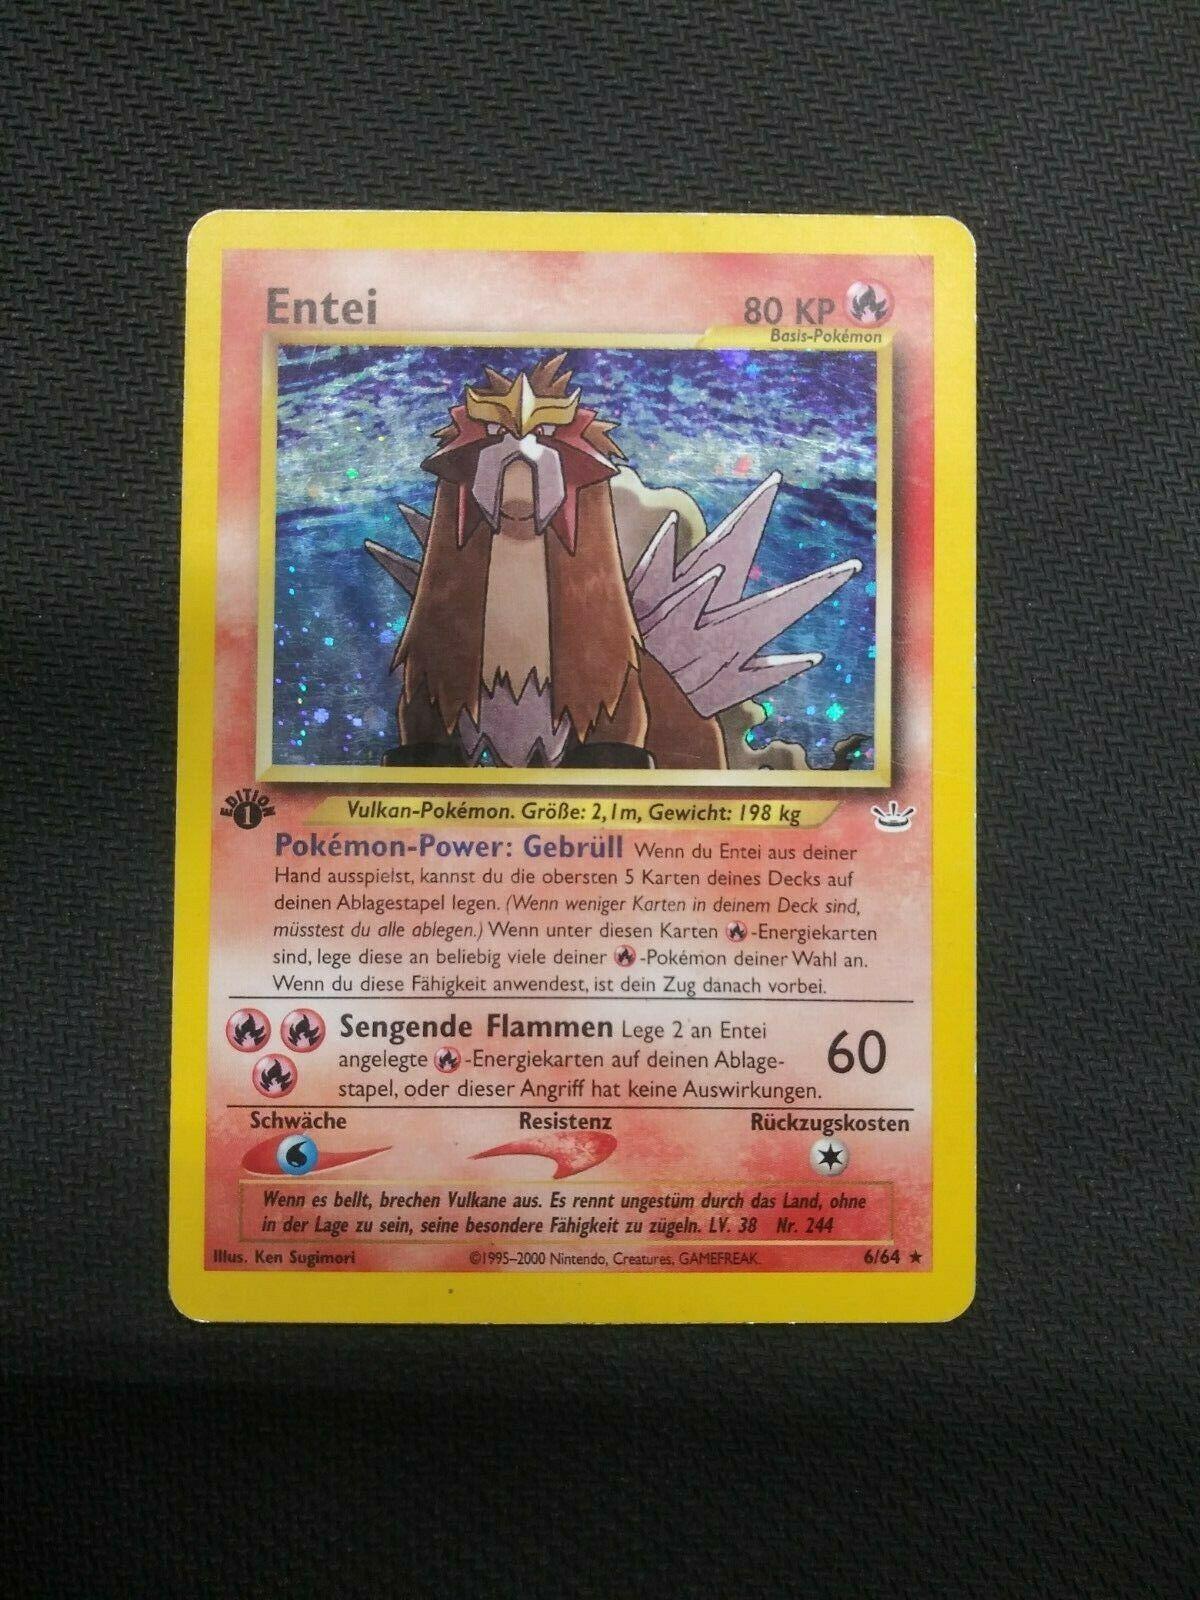 244 Holo Foil Rare Neo Revelations NM Pokemon Card Japanese Entei No